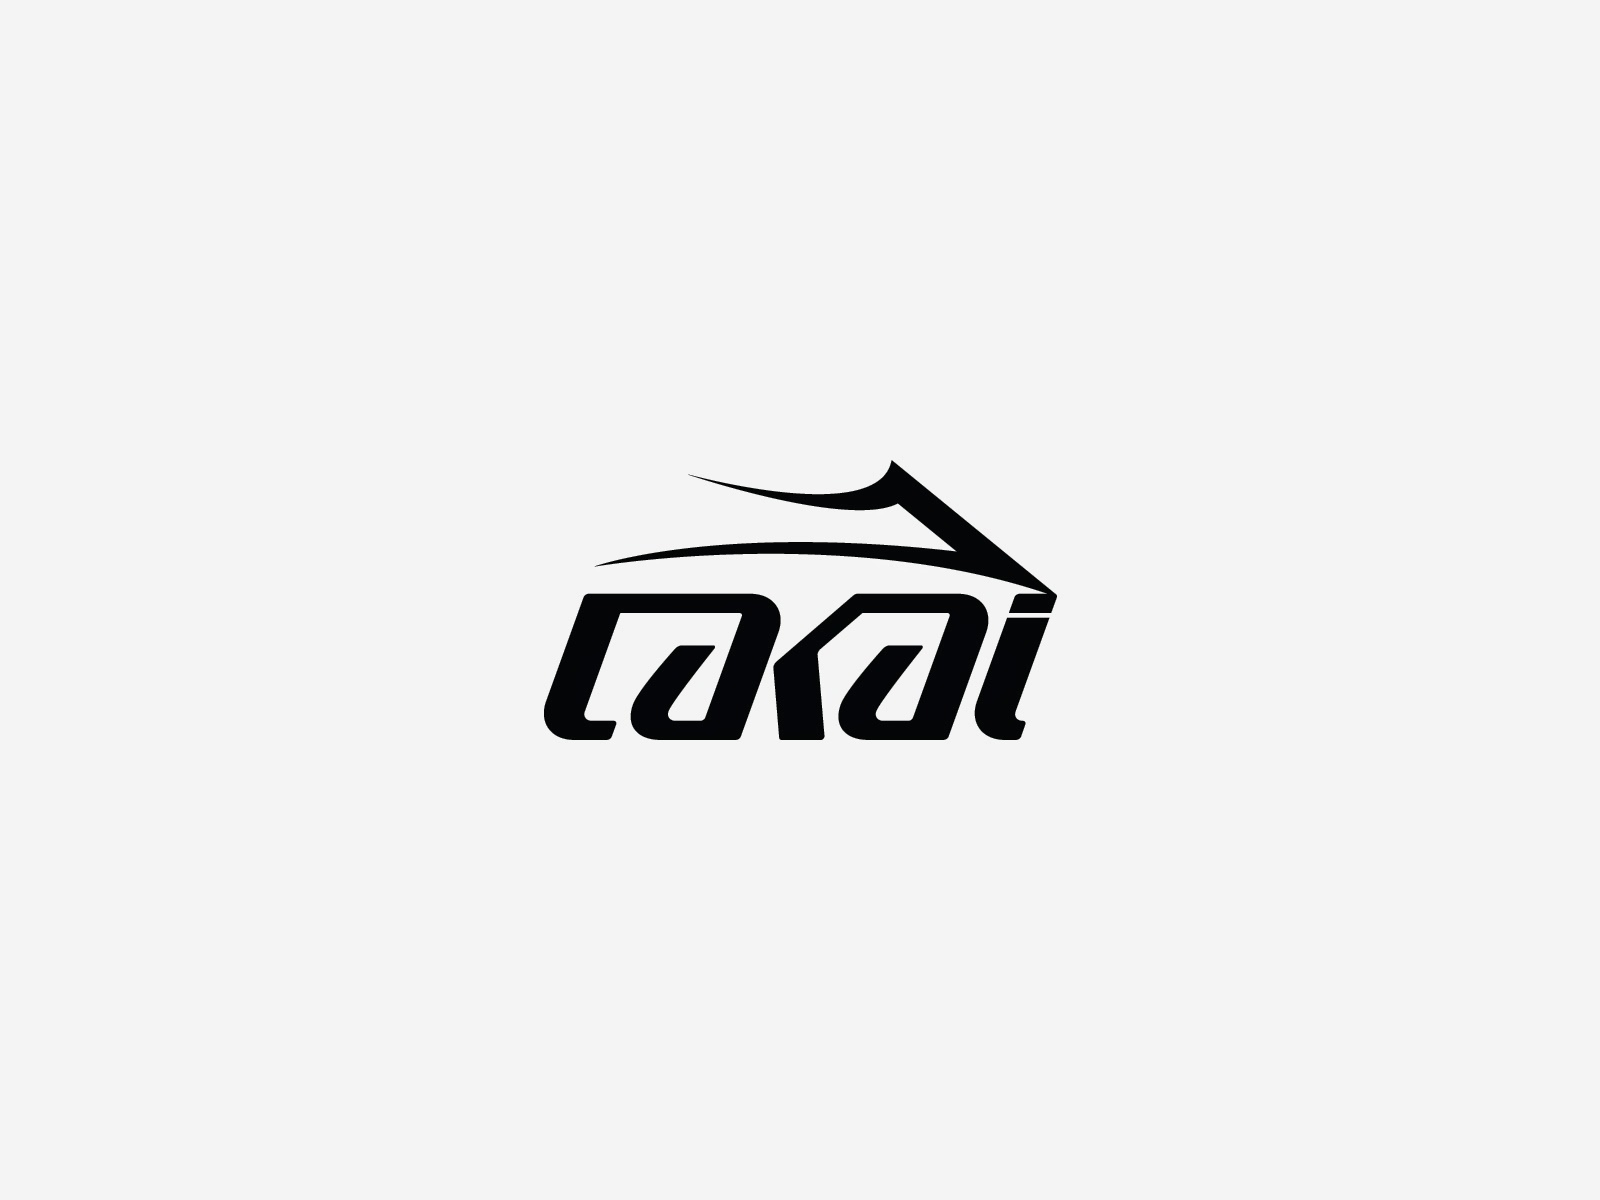 Dgk Wallpaper Iphone Lakai Skateboard Logo Skateboard Wallpaper Hd